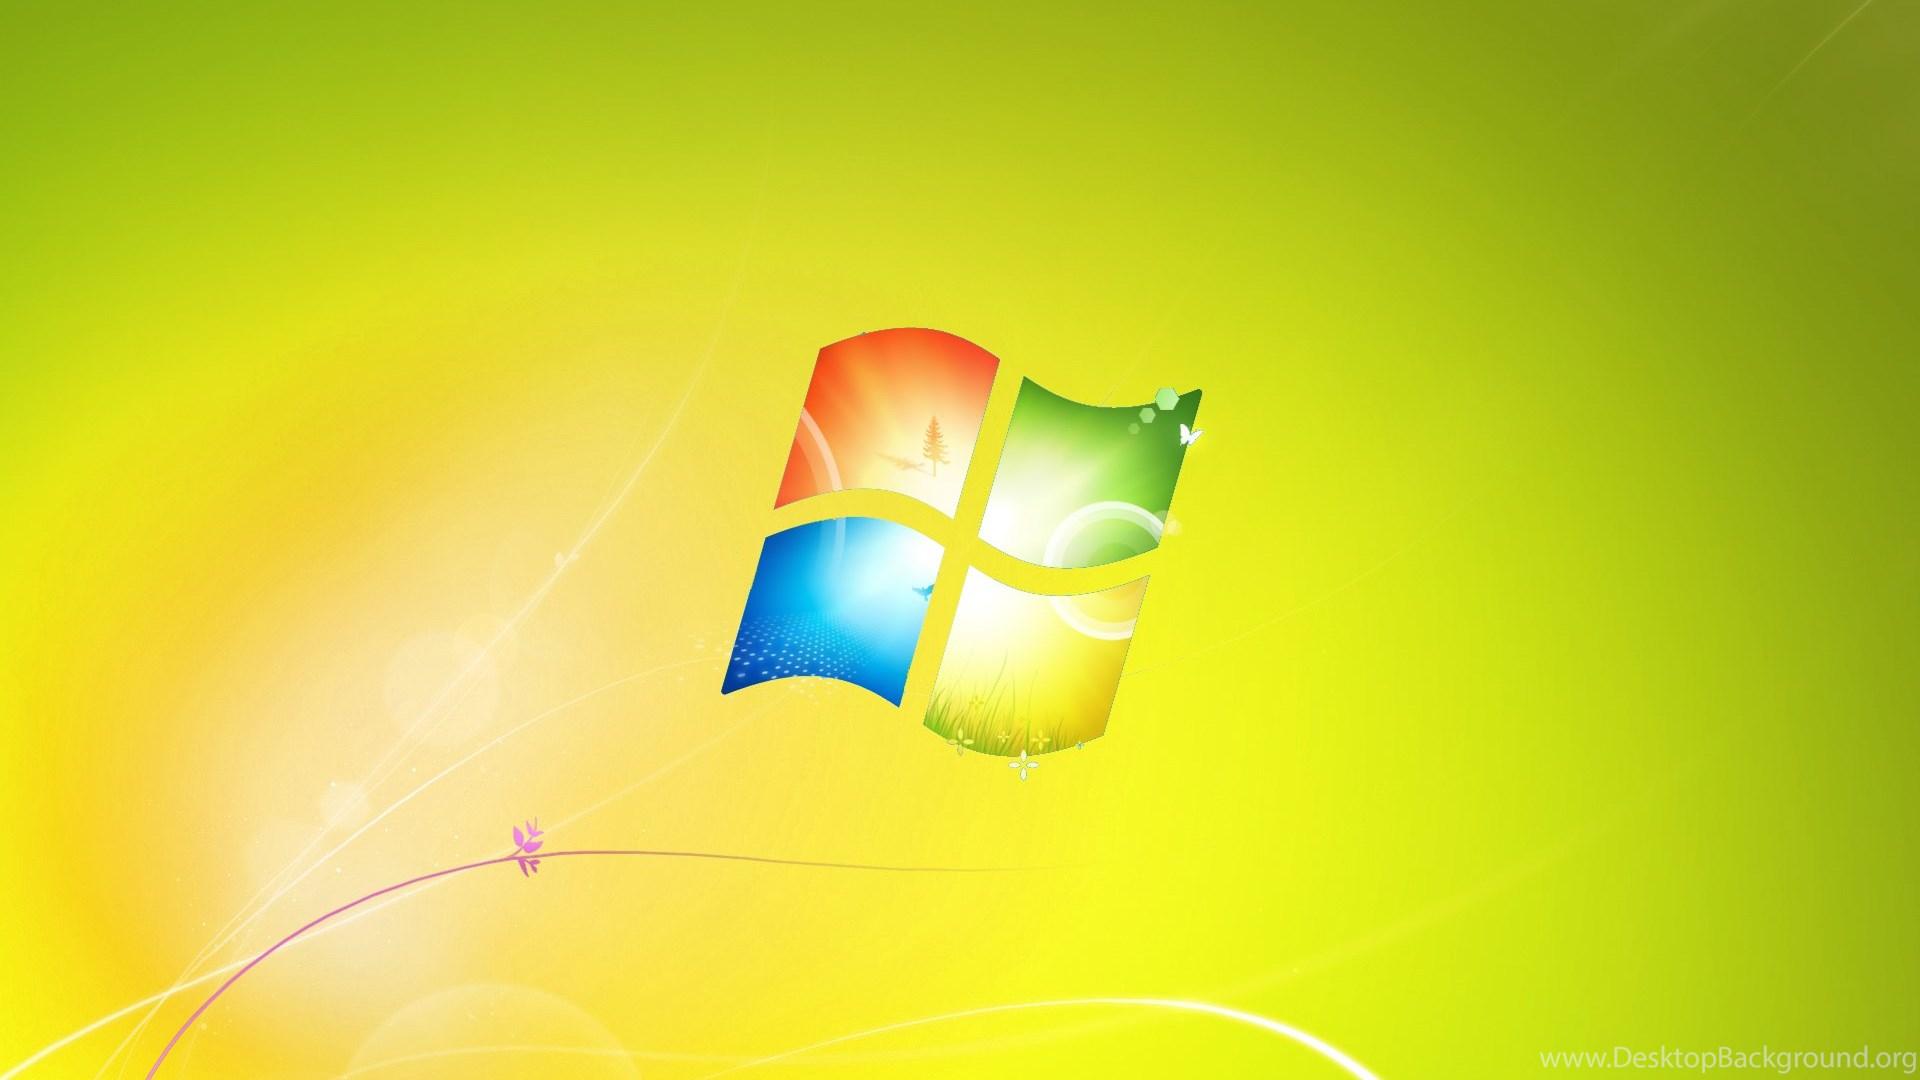 Windows 7 Default High Definition Wallpapers Brands